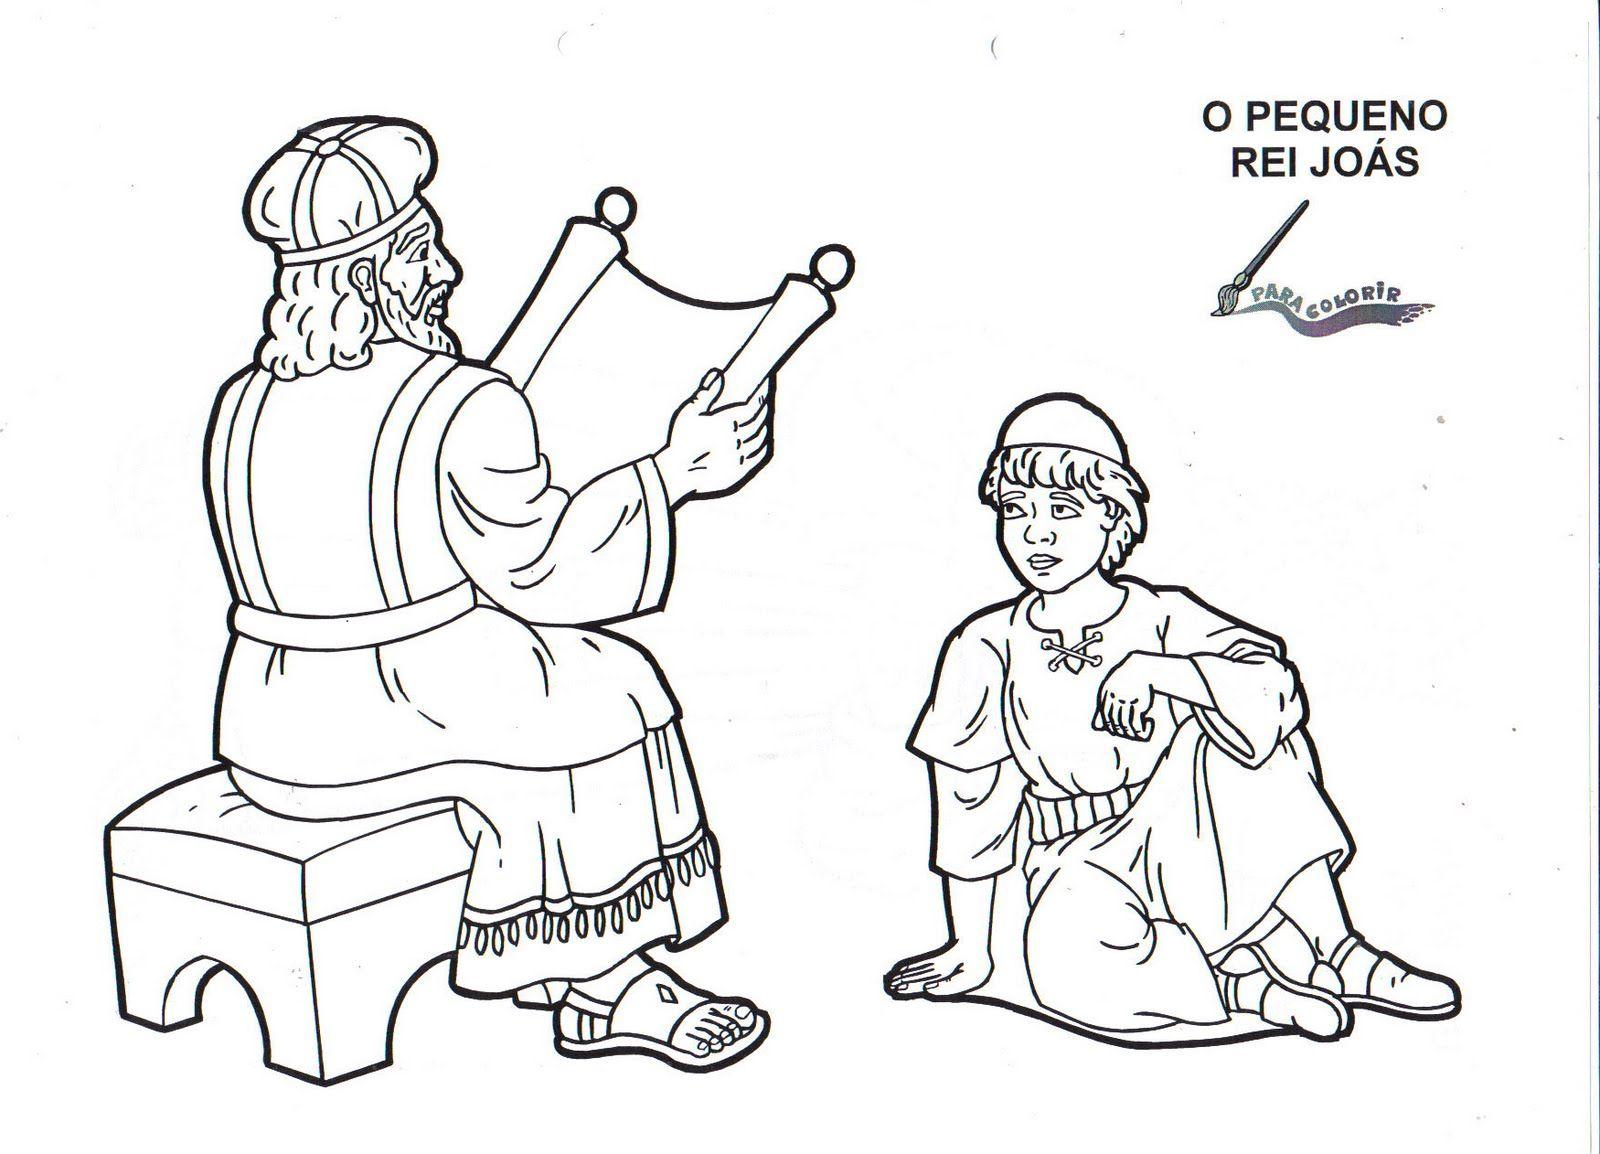 figura do rei joas - Pesquisa Google